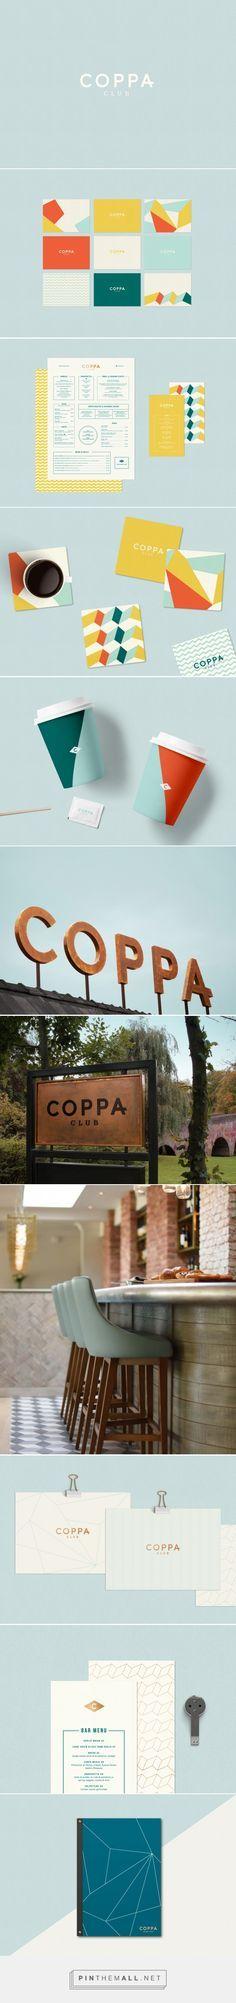 Coppa Club Branding by The Plant | Fivestar Branding – Design and Branding Agency & Inspiration Gallery